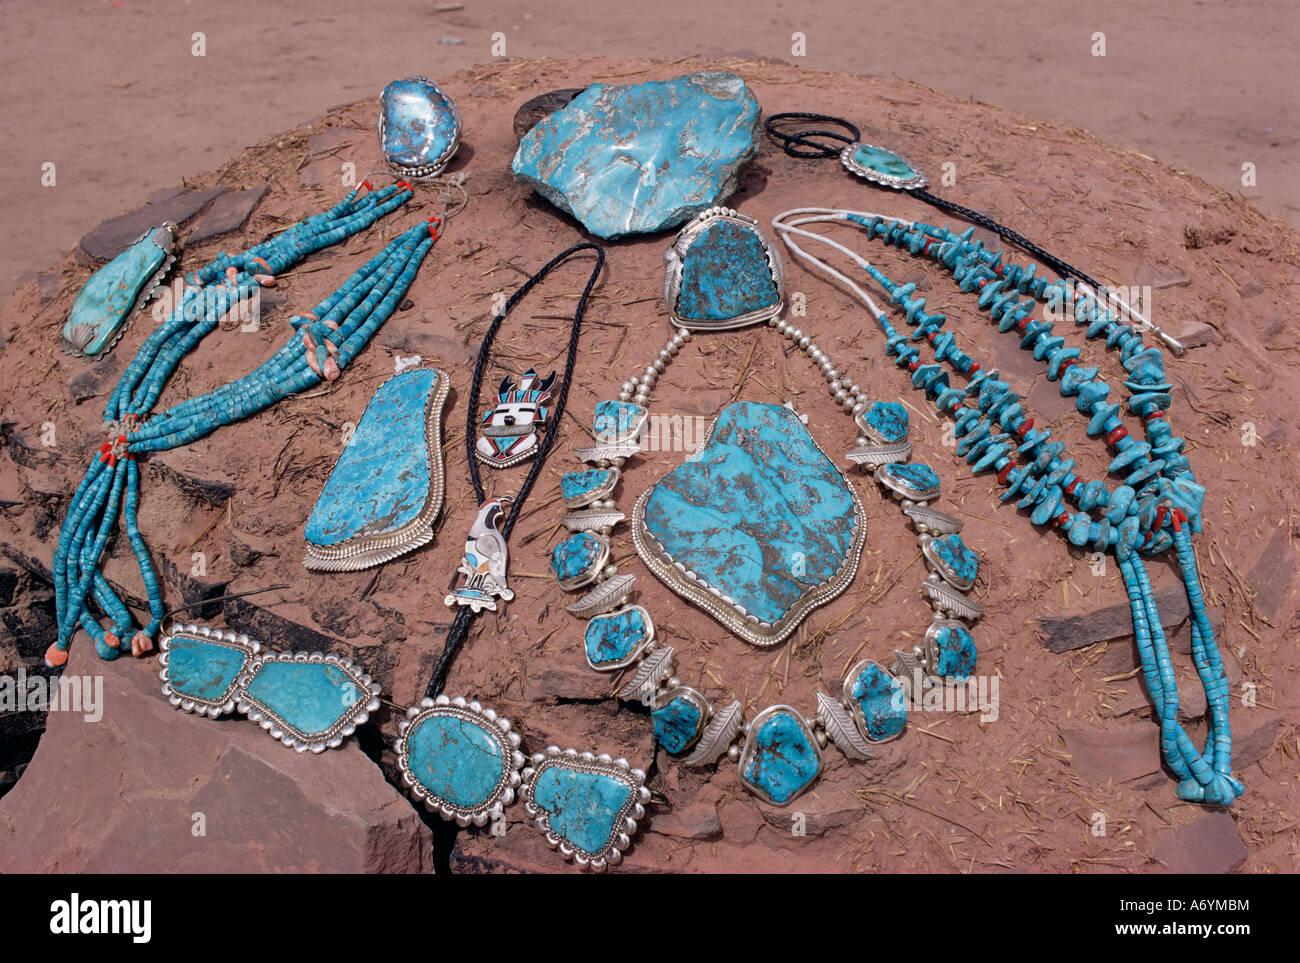 Navajo crafts United States of America North America - Stock Image